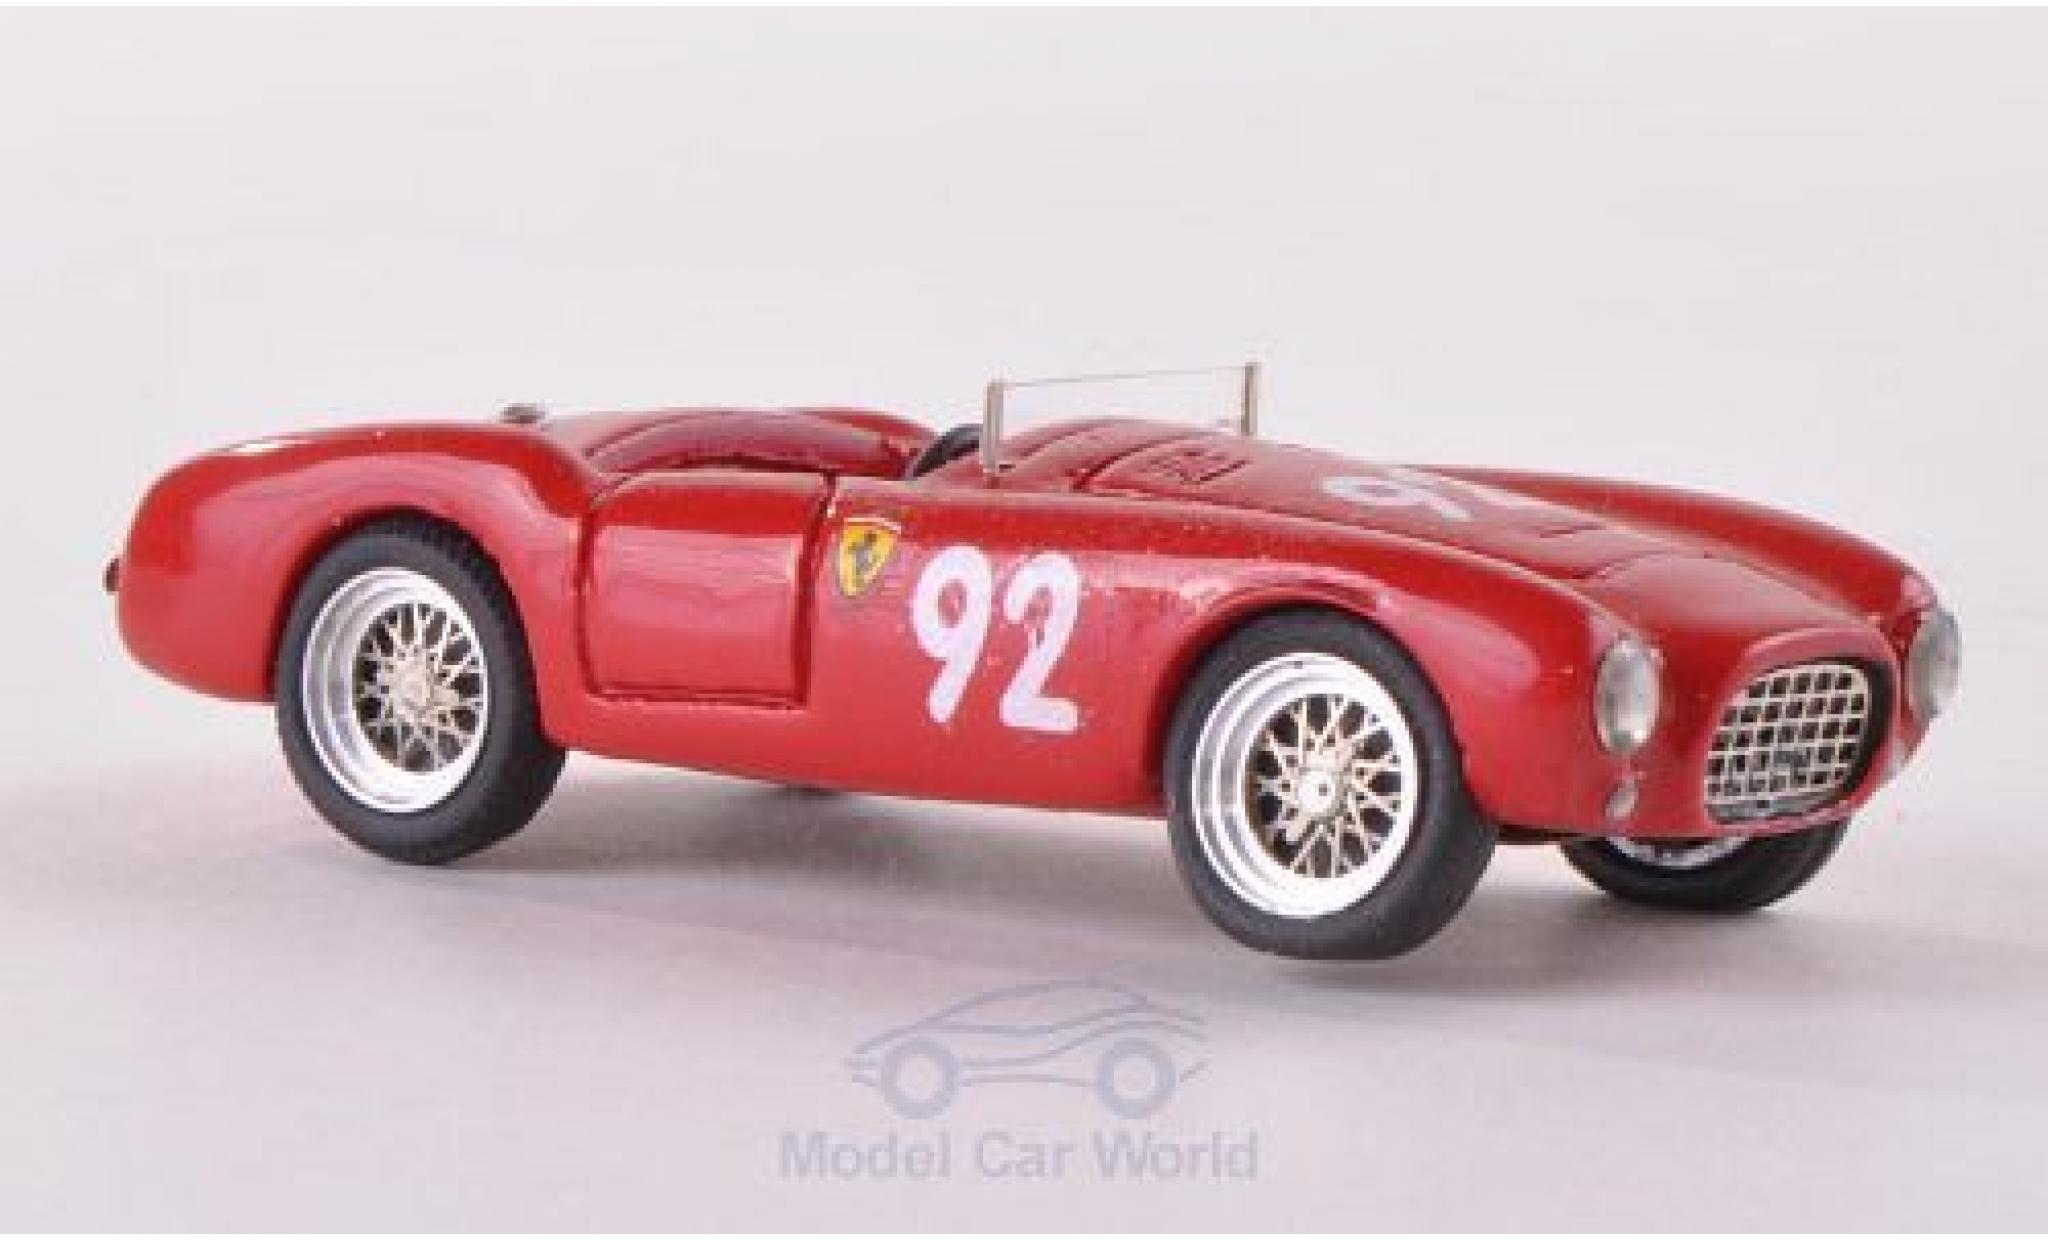 Ferrari 225 1/87 Jolly Model S Vignale No.92 Coppa Dolomiti 1952 ohne Vitrine